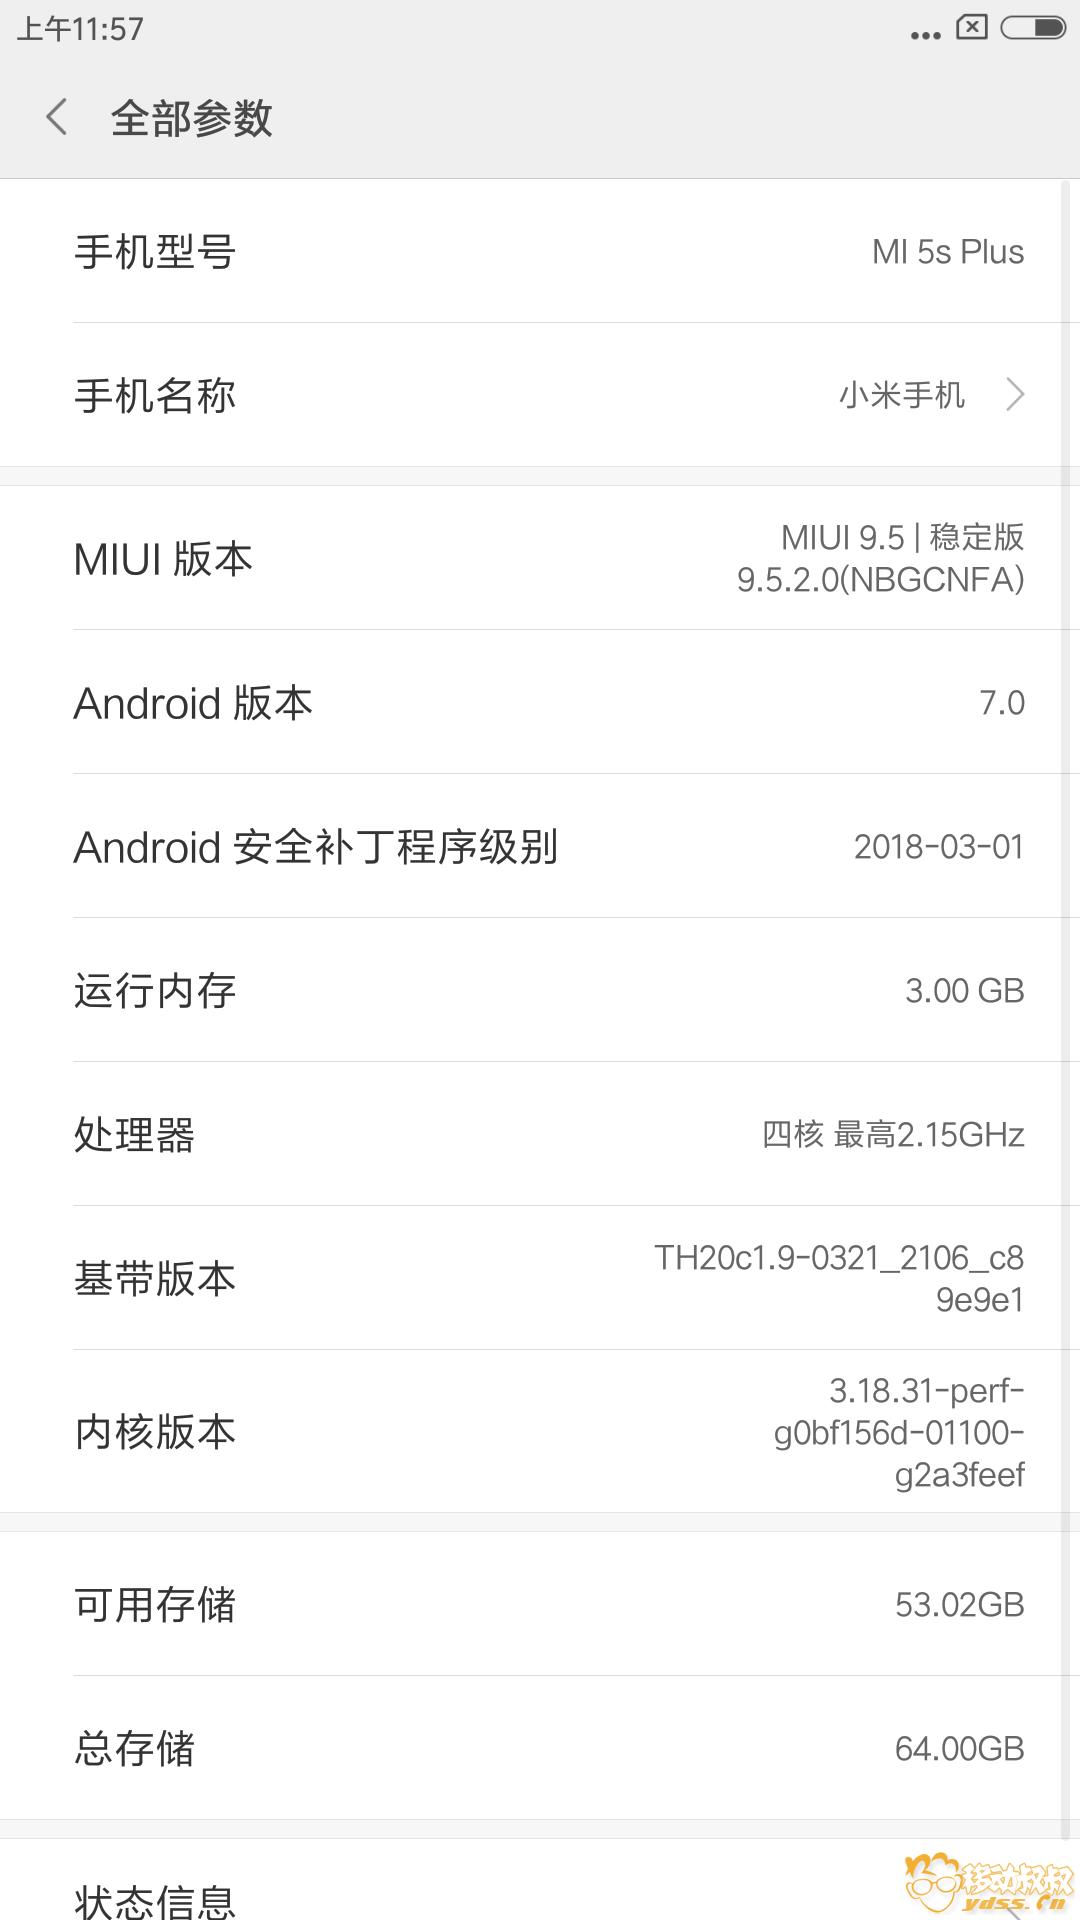 Screenshot_2018-06-17-11-57-34-188_com.android.settings.png